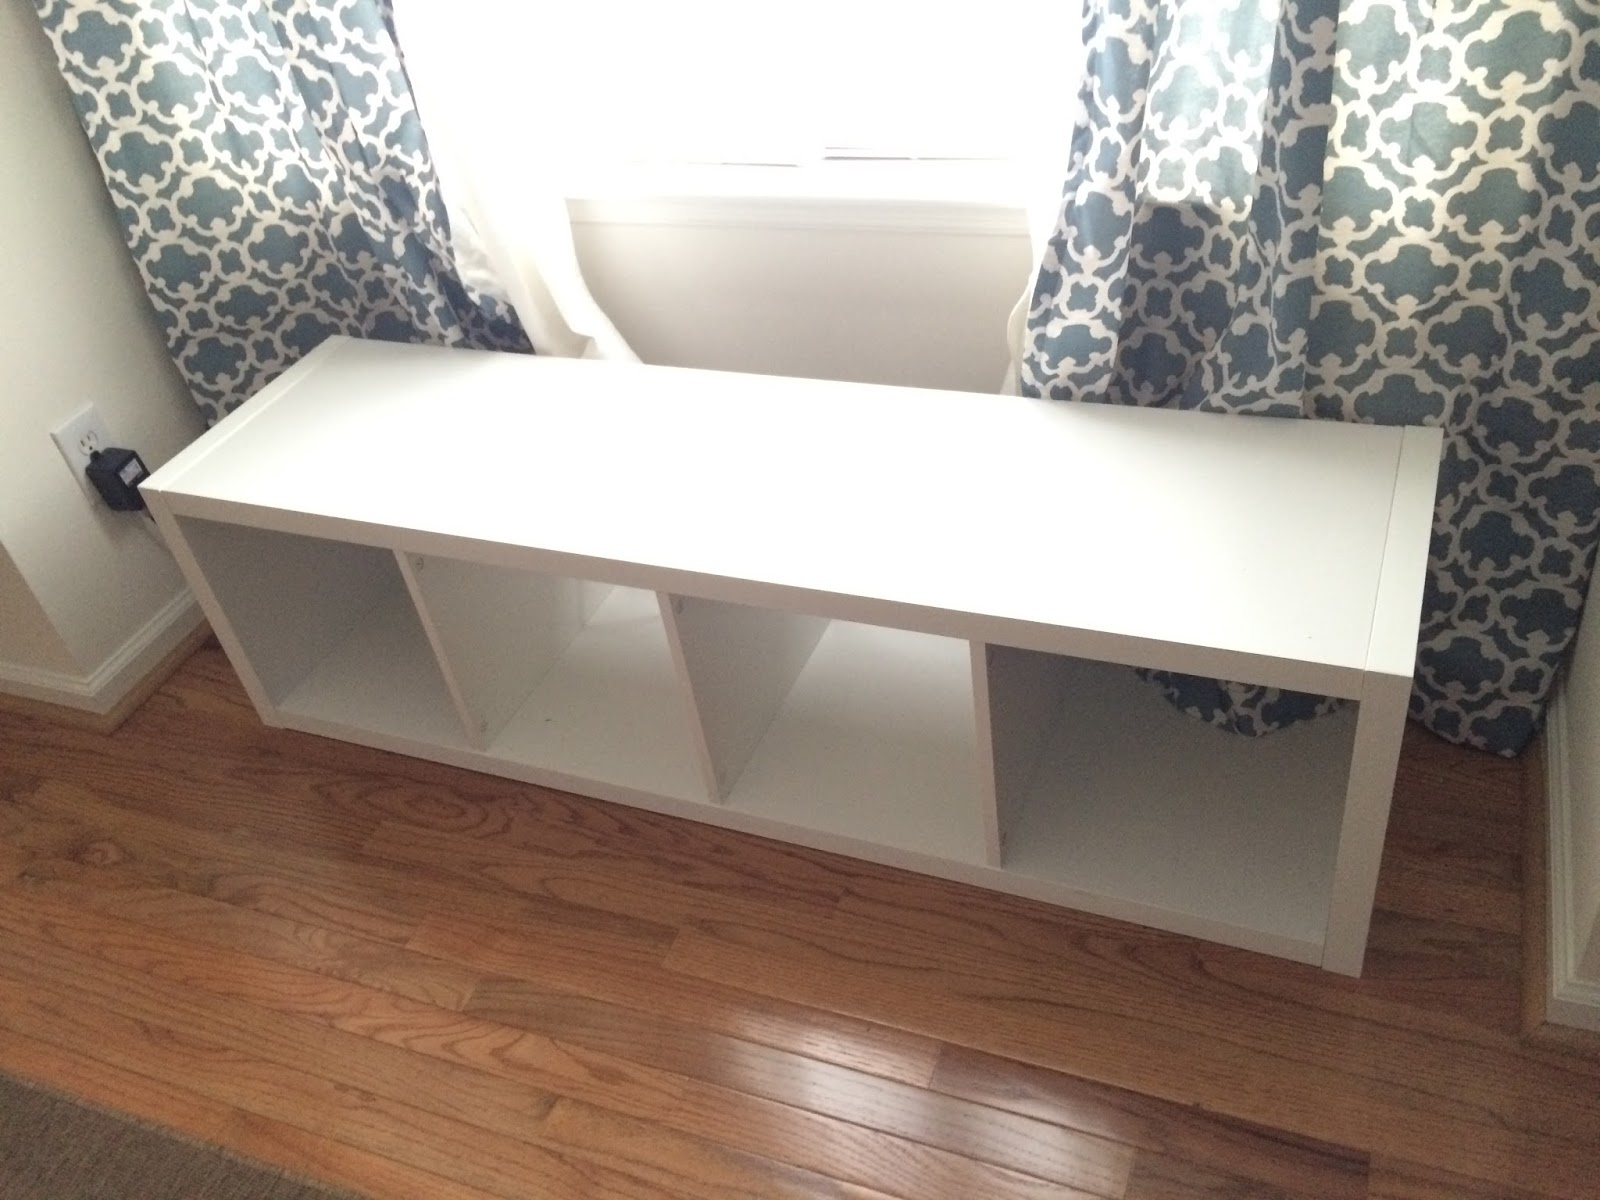 The Adorable Mess Diy Ikea Kallax Storage Bench